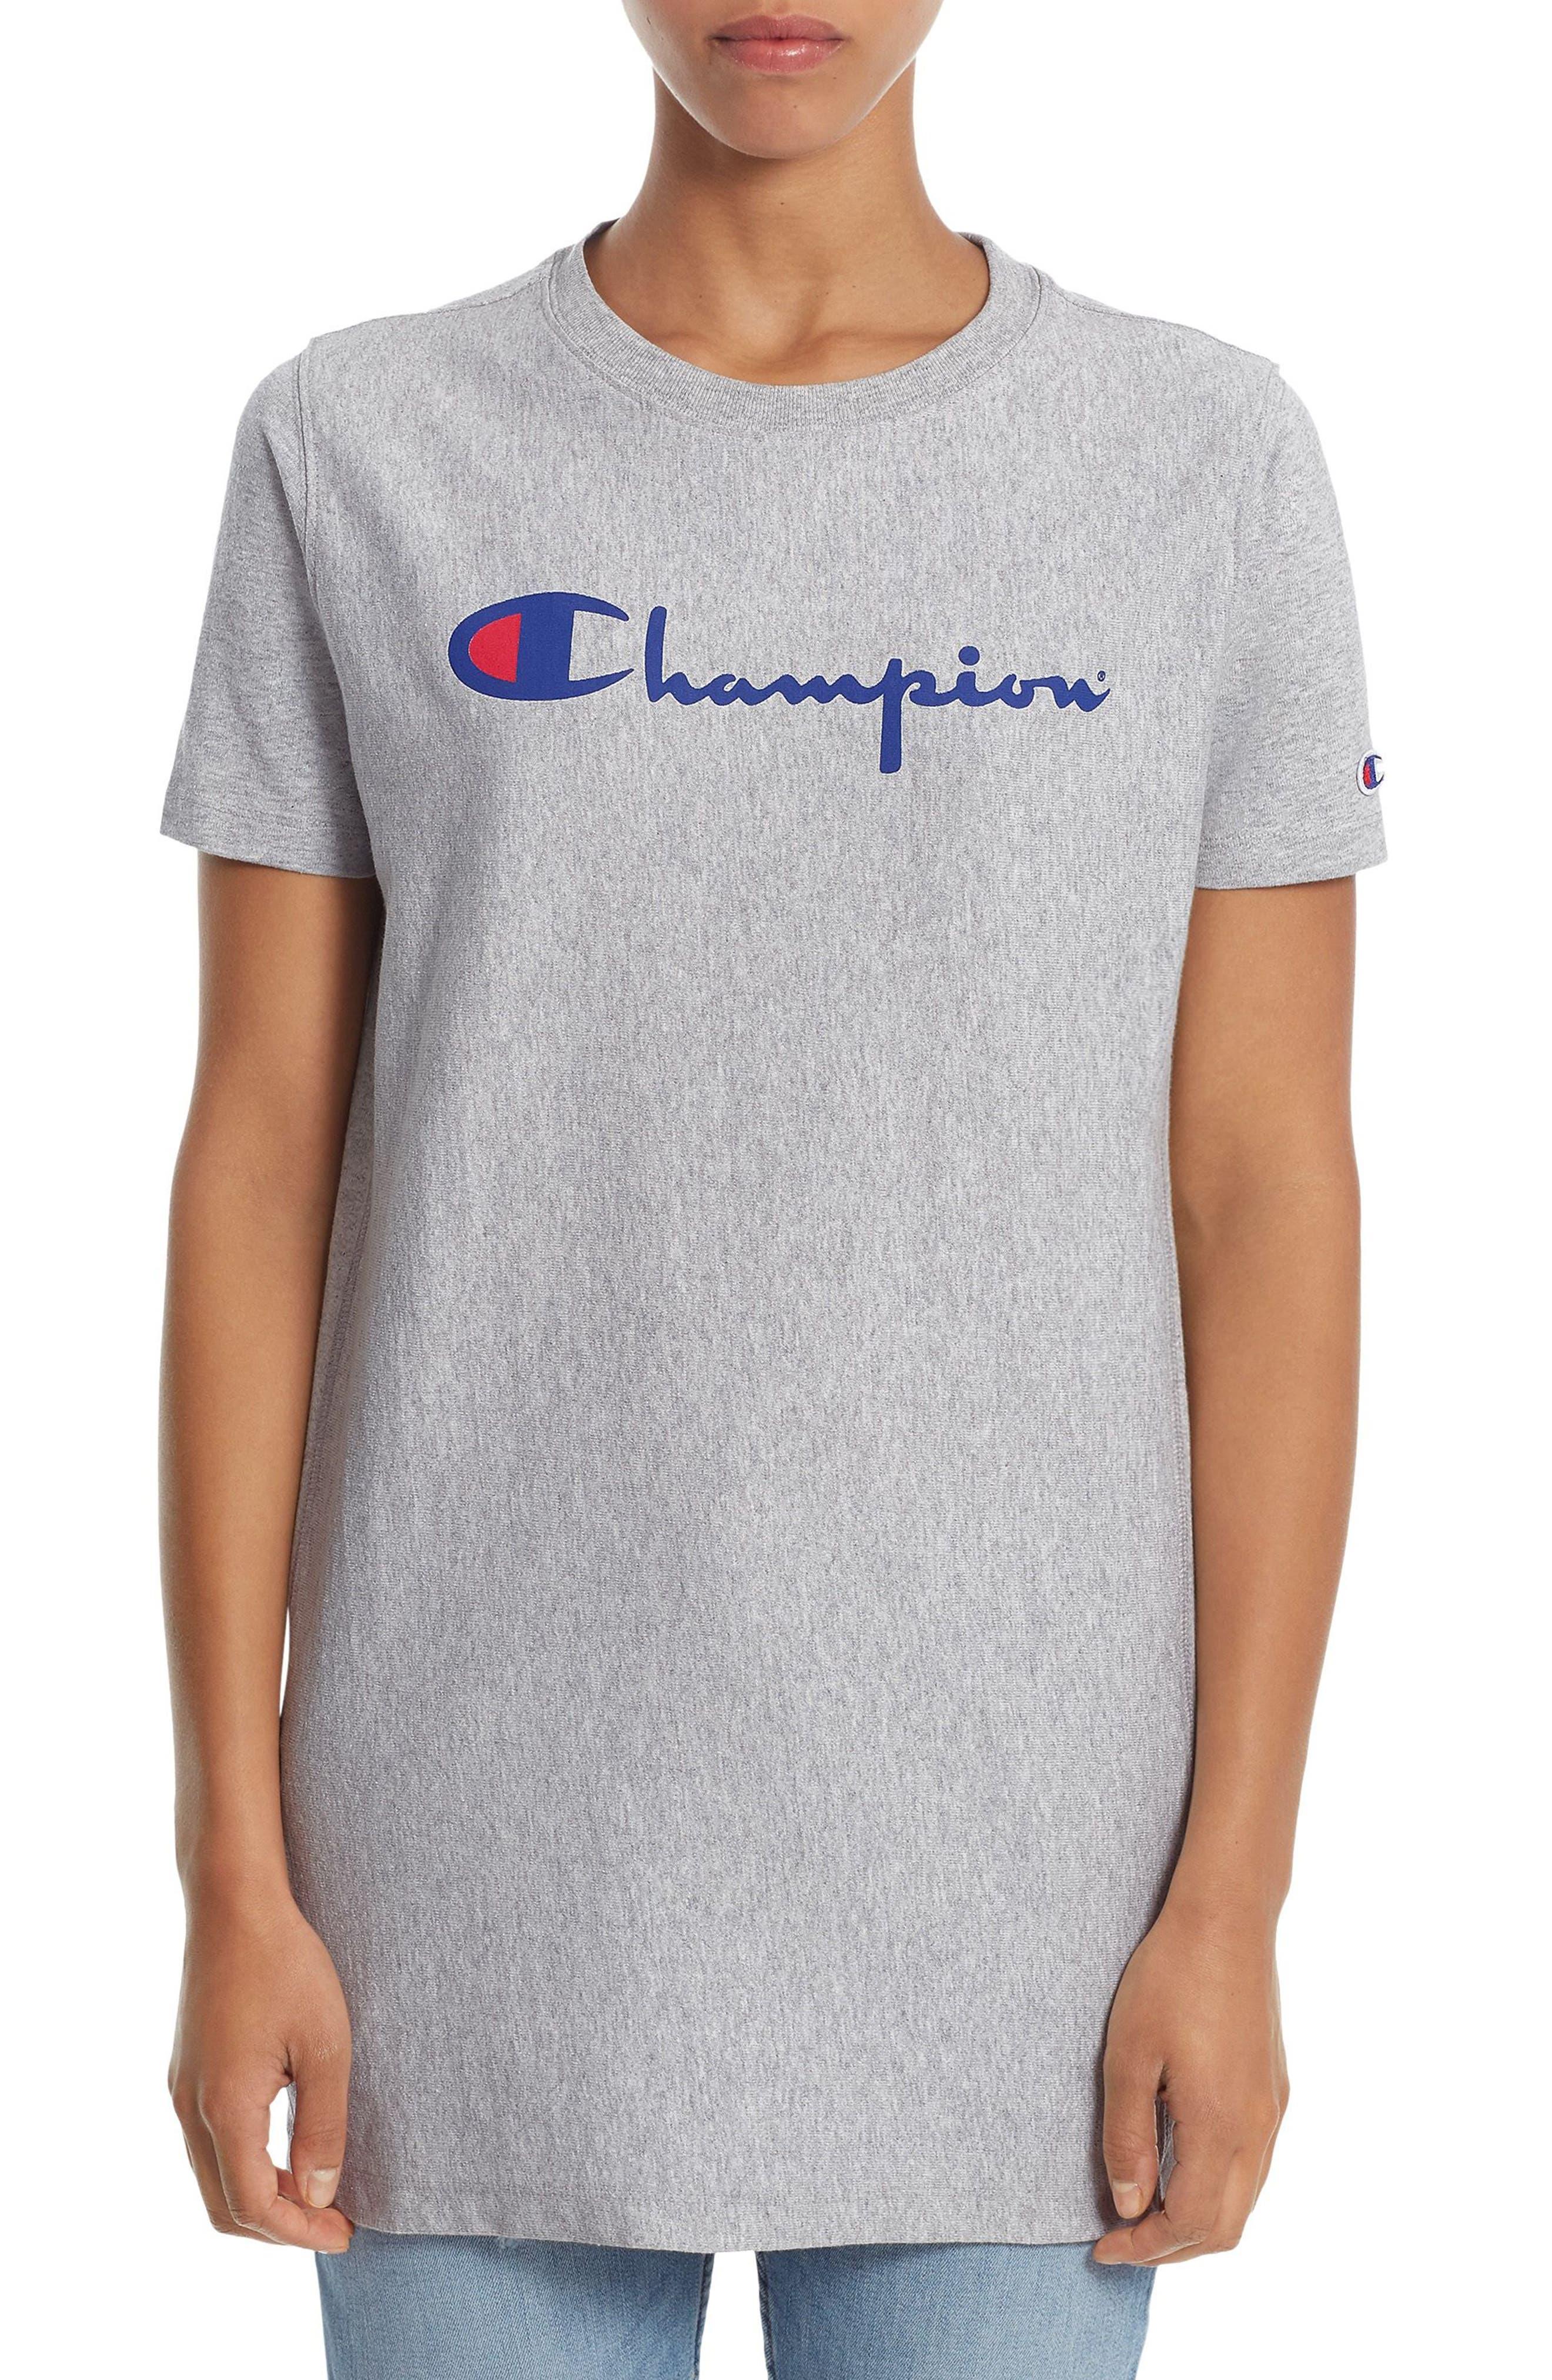 Main Image - Champion Logo Print Longline Tee